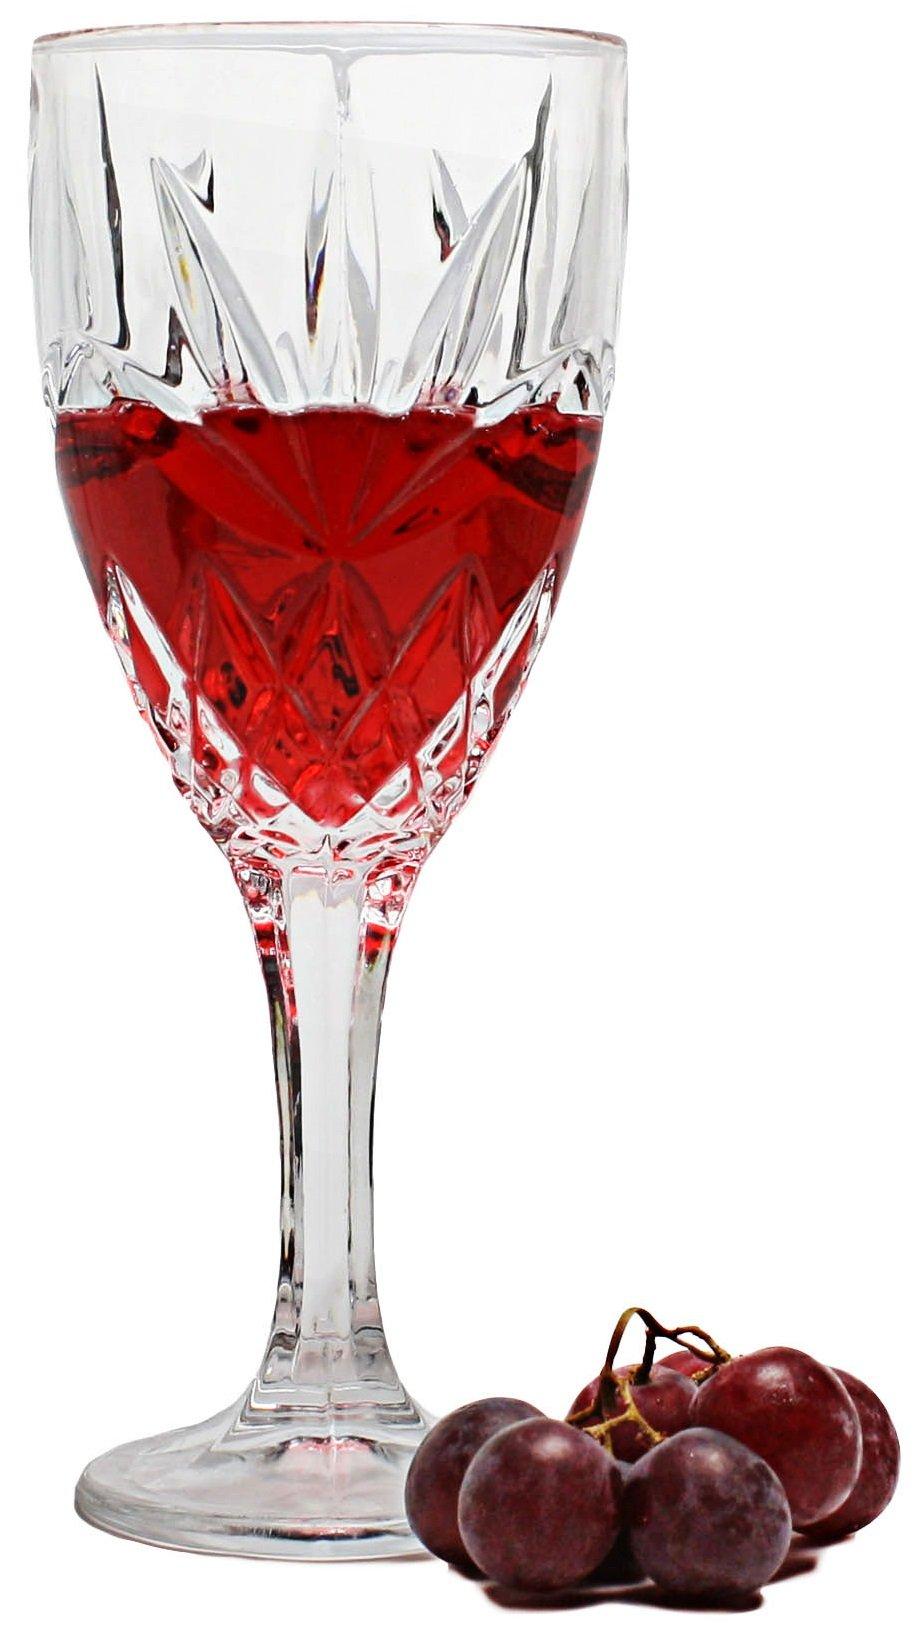 Bezrat White Wine Glasses Set of 6 12 Oz Superior Lead Free Crystal Beautifully Designed Stemware Wine Glasses